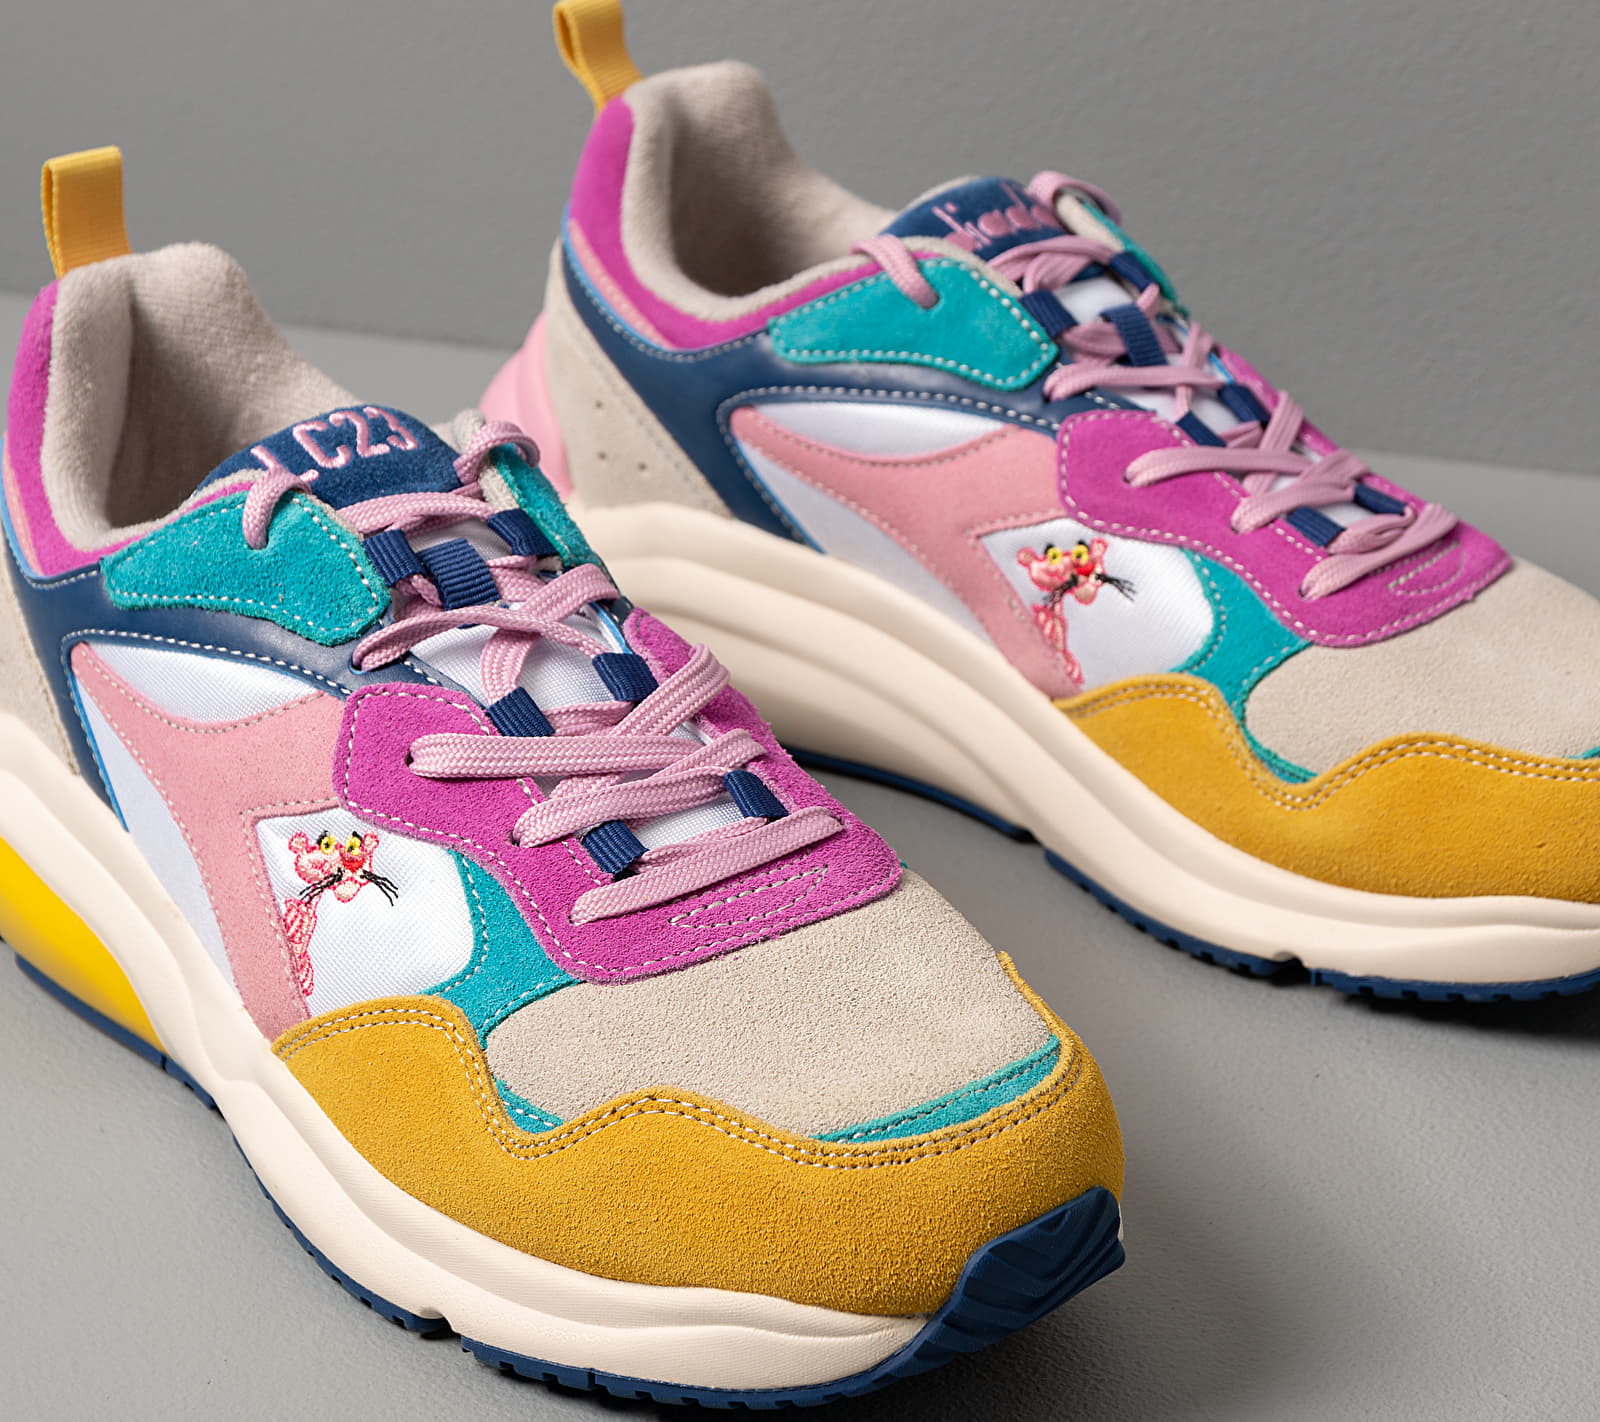 Diadora x LC23 x Pink Panther Whizz Run Summer Fuchsia, Multicolour